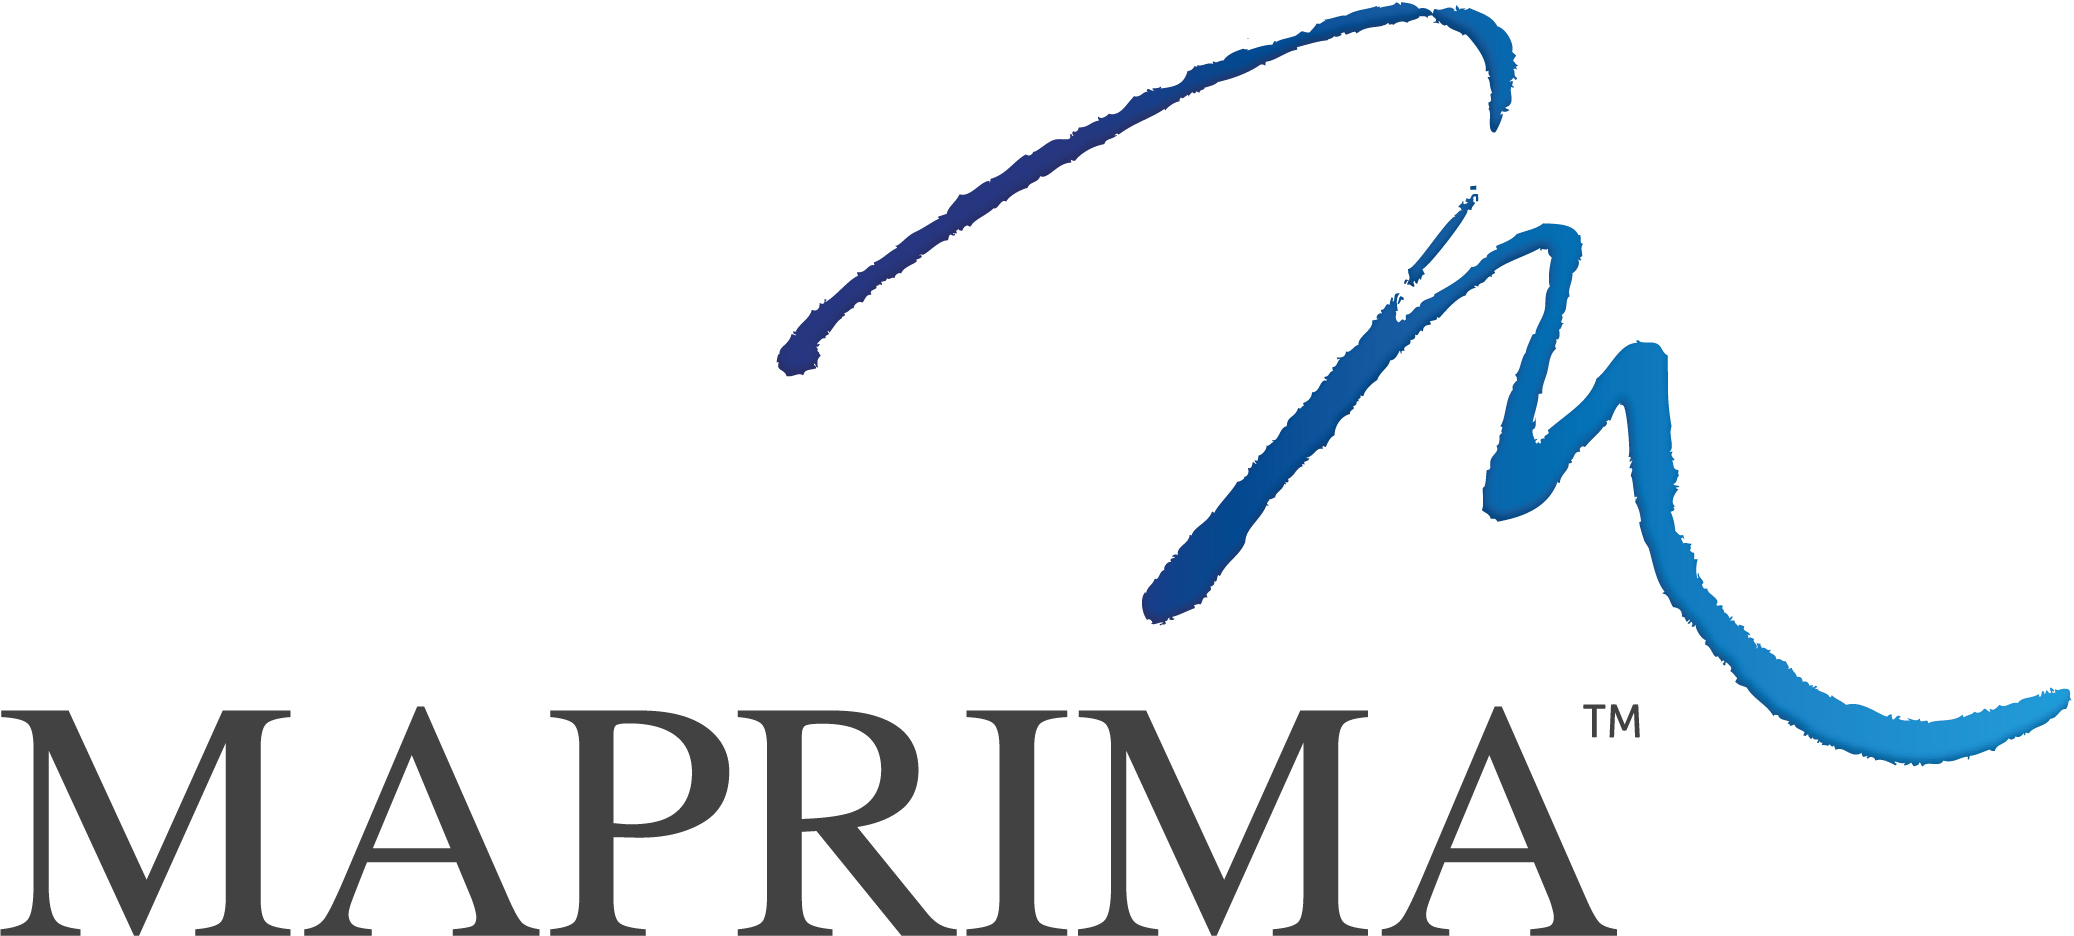 Maprima logo